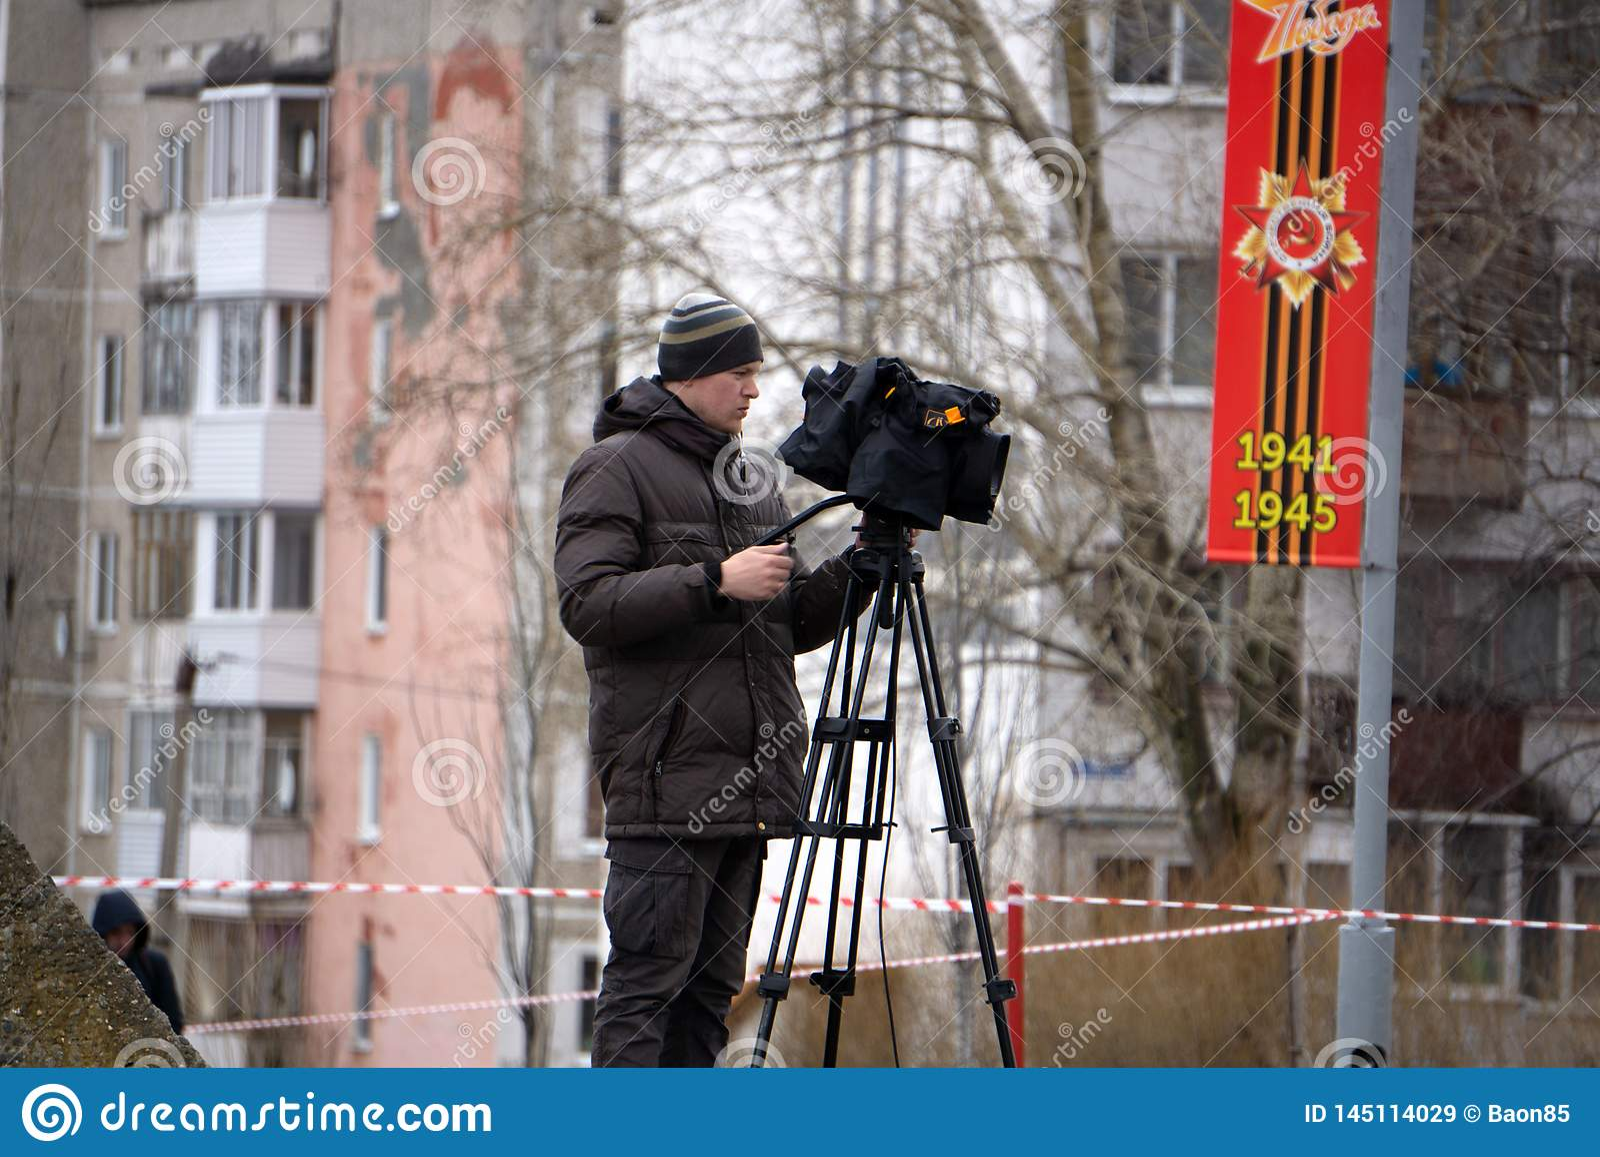 Bak platserna av video produktion eller video skytte - Ryssland - Berezniki p? 9 kan 2018